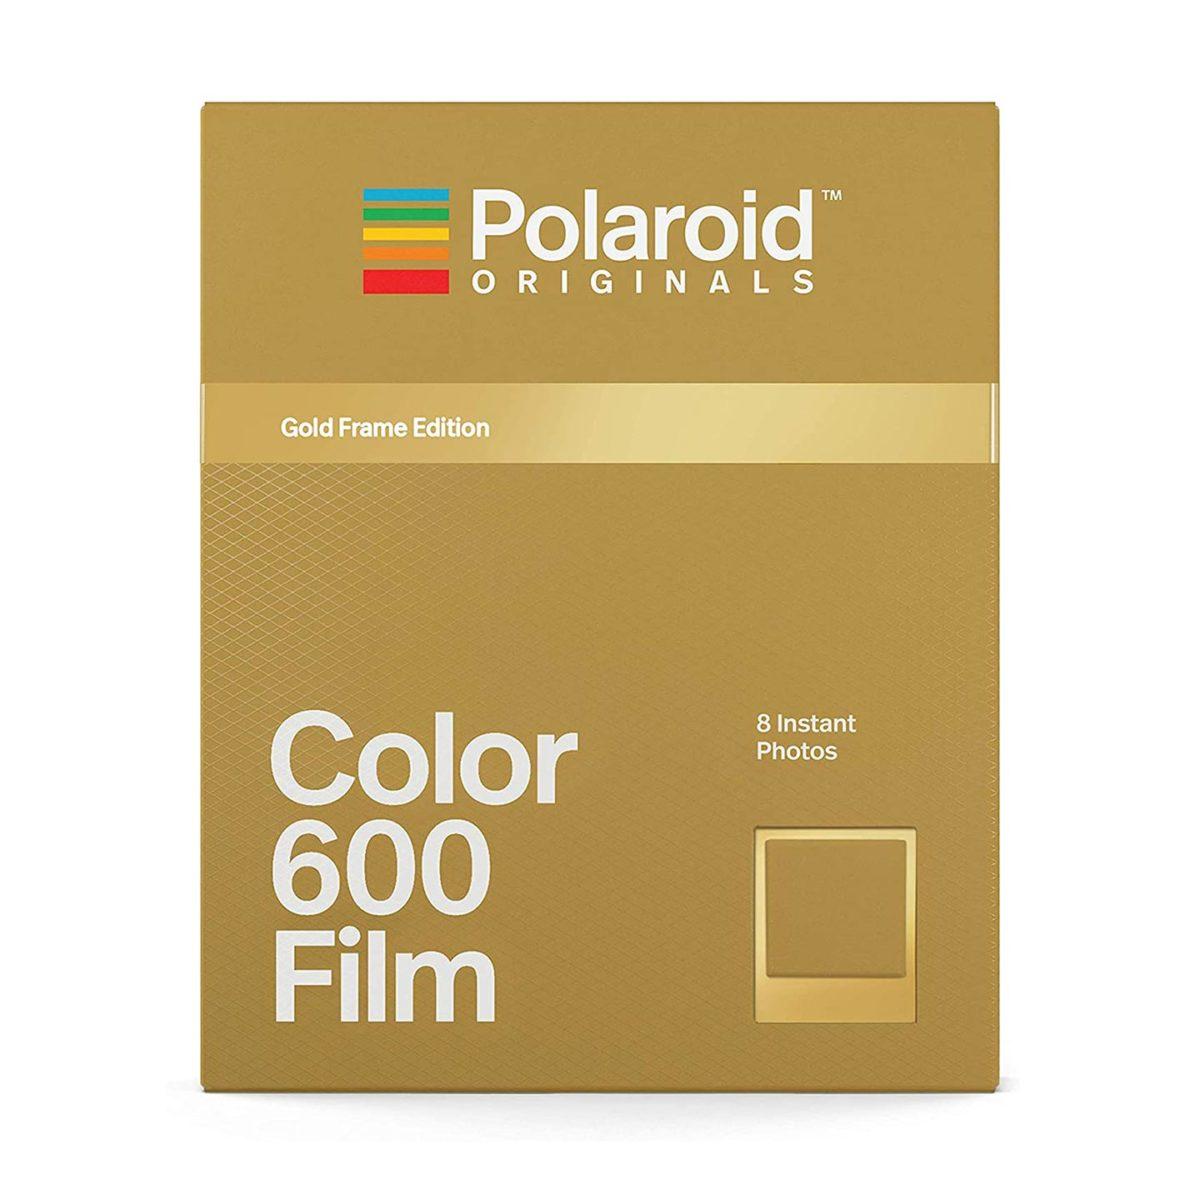 polaroid_600_color_film_gold_frame_02